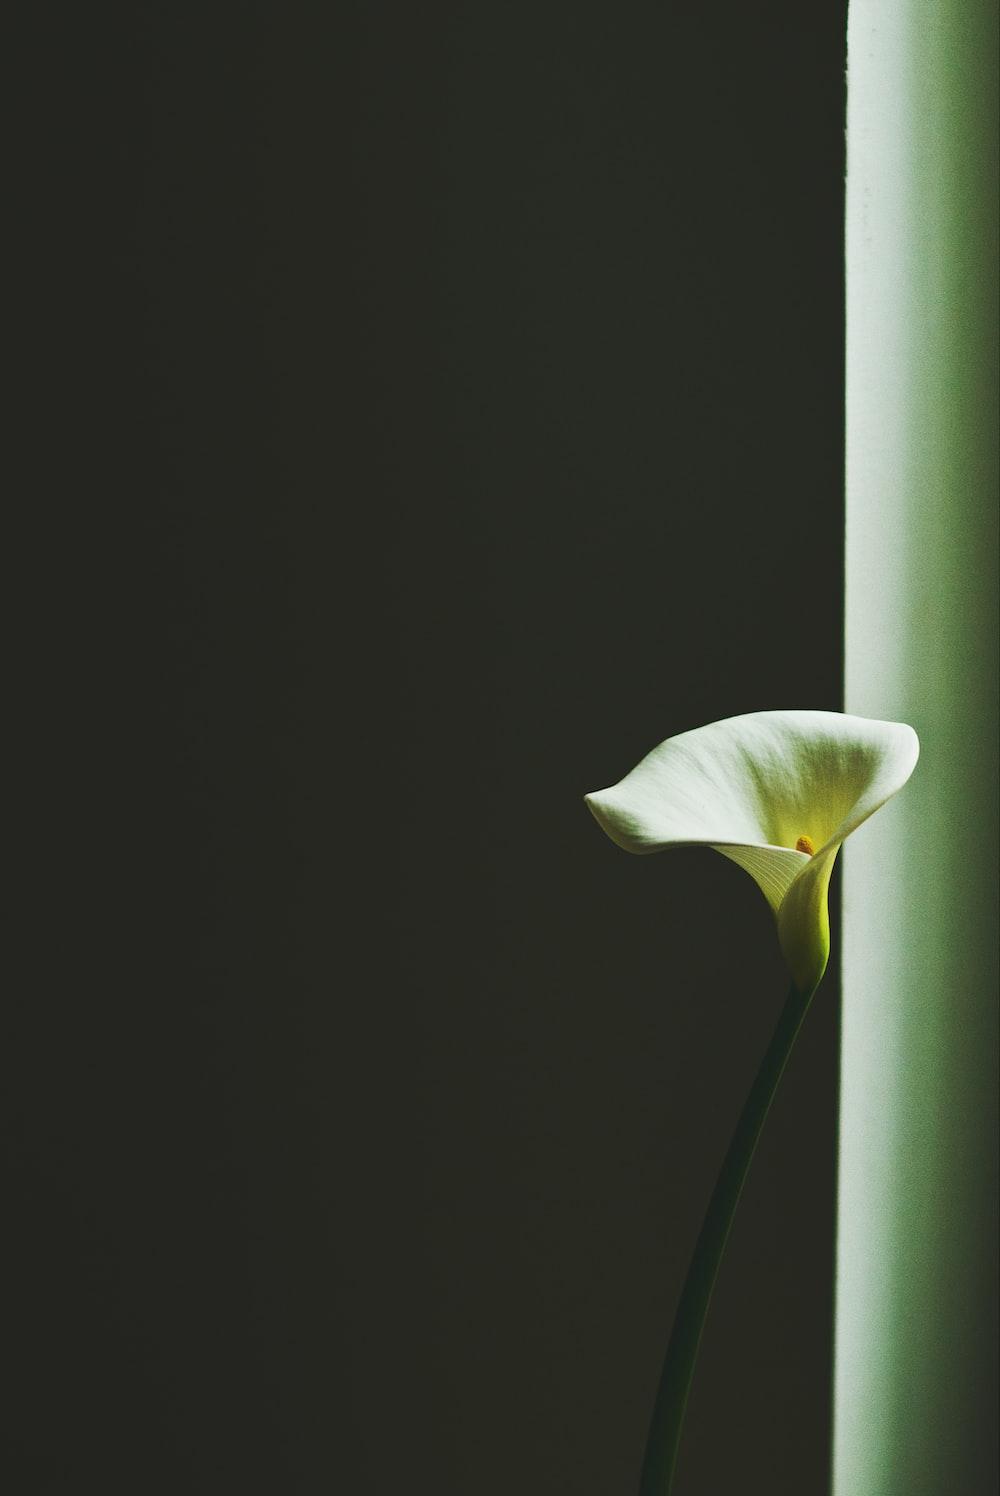 closeup photo of white peace lily near the window